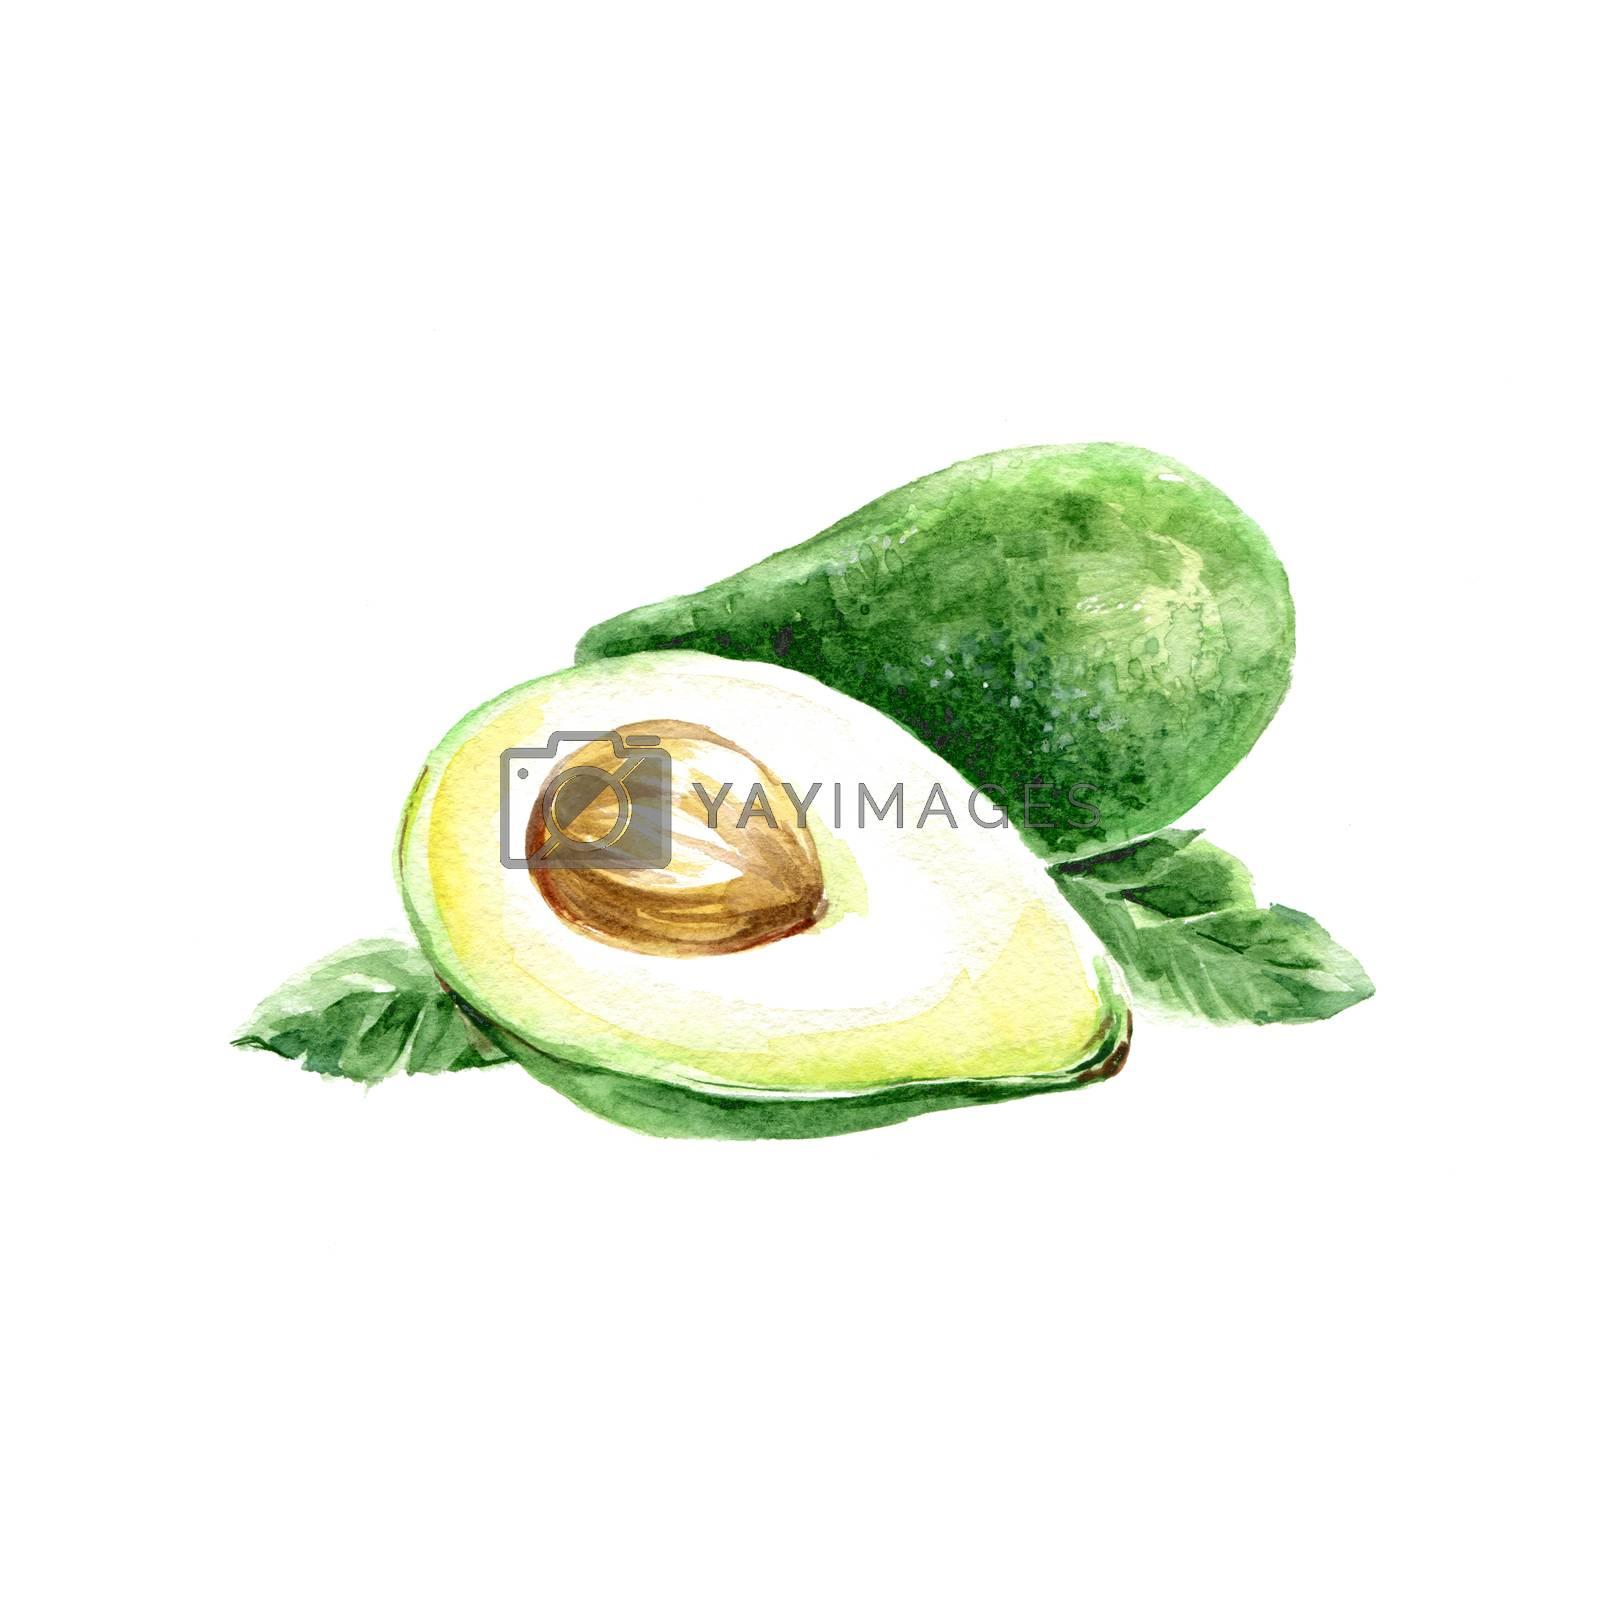 Watercolor Avocado. Hand Drawn Illustration Organic Food Vegetarian Ingredient